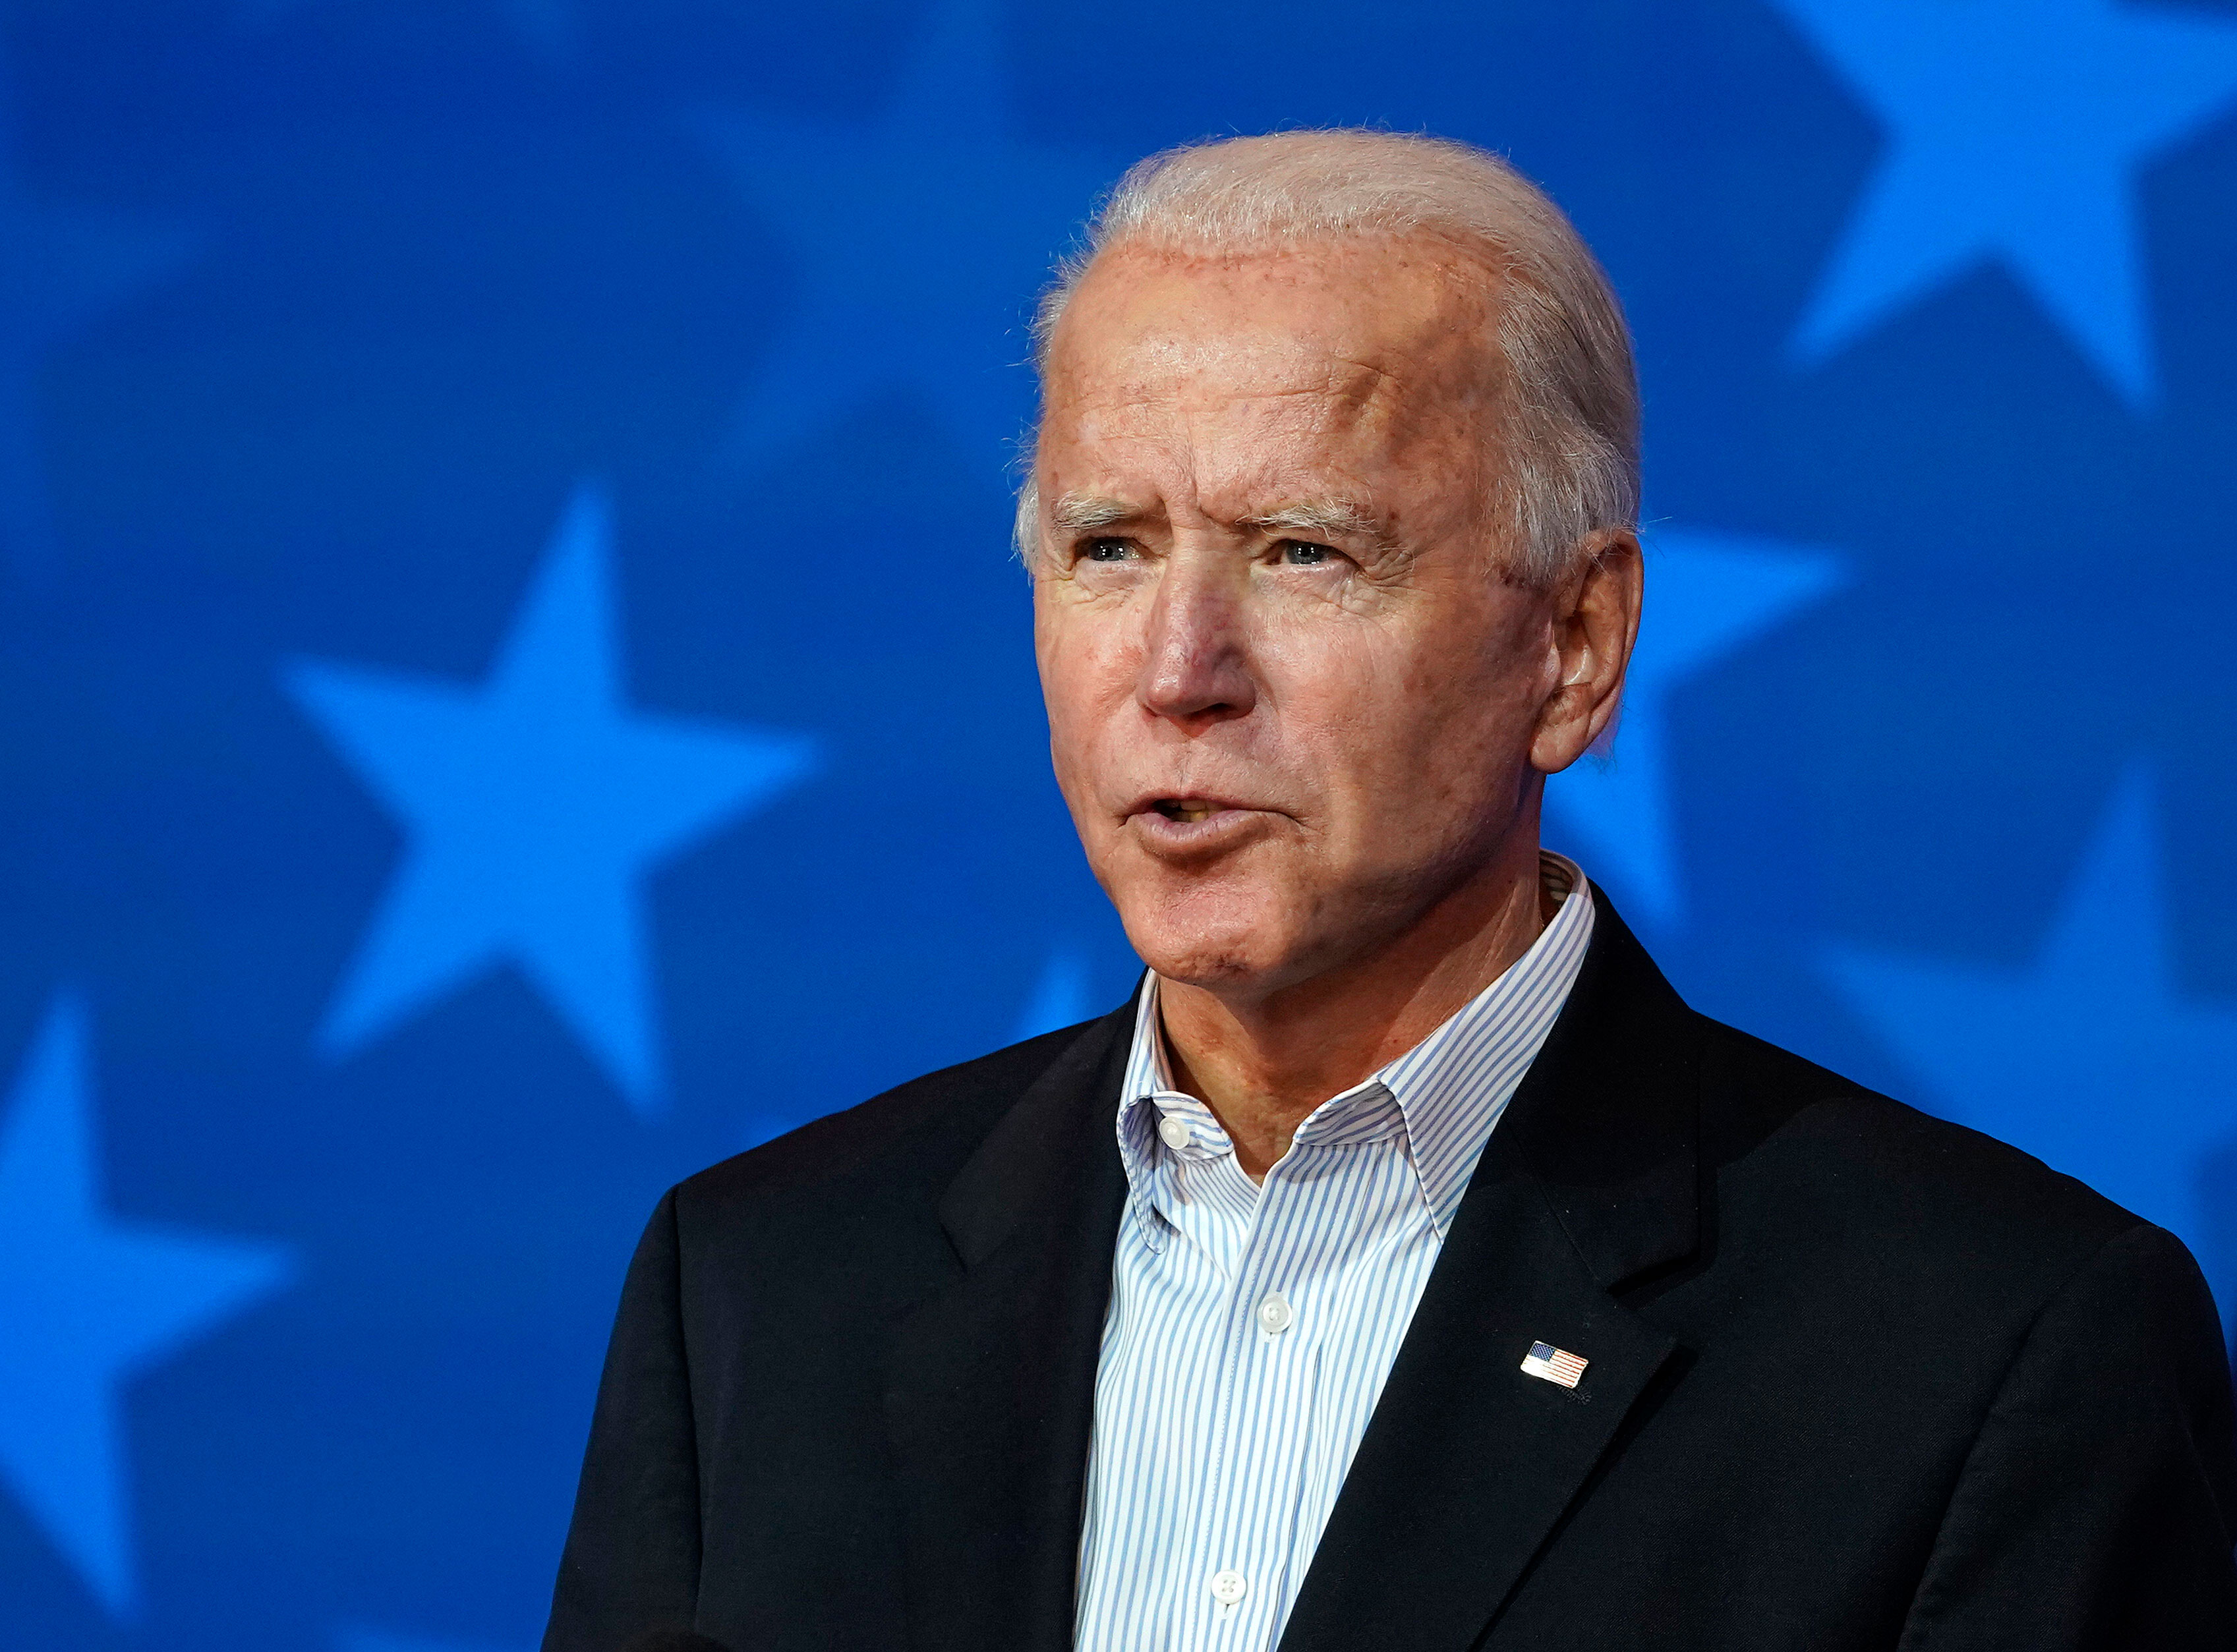 Democratic presidential nominee Joe Biden speaks in Wilmington, Delaware, on November 5.